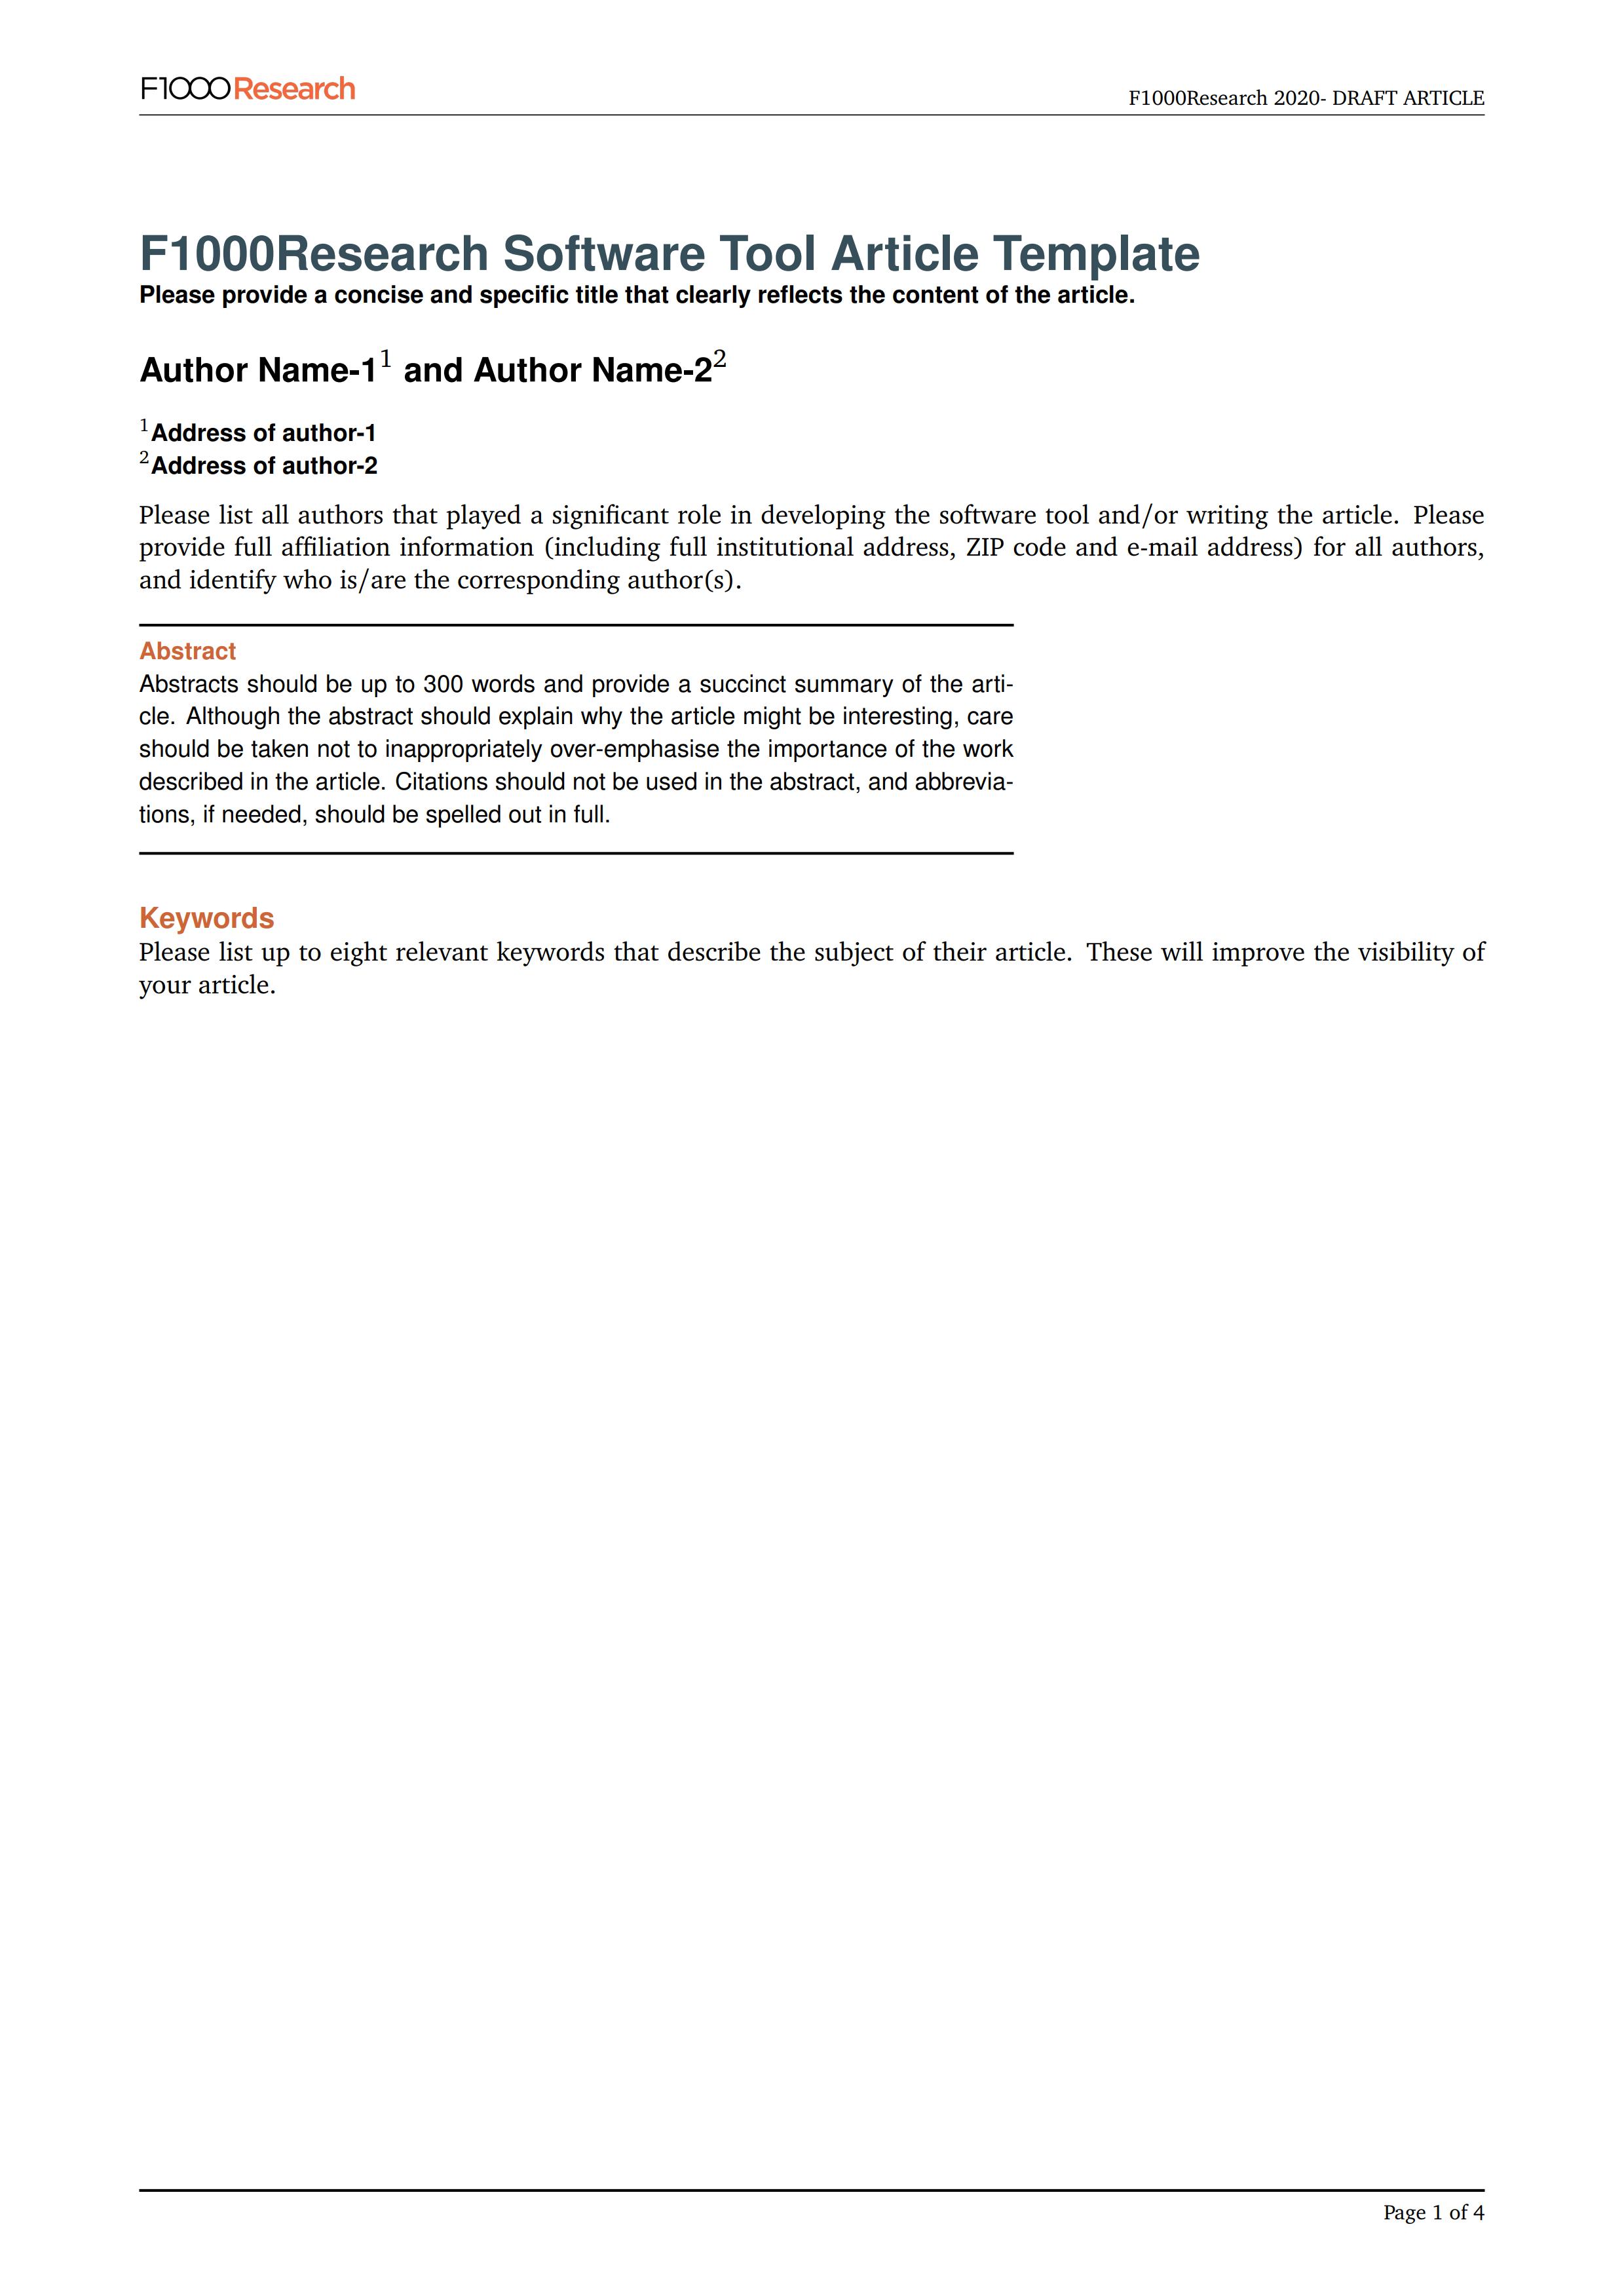 F1000Research 期刊的 LaTeX 投稿模板